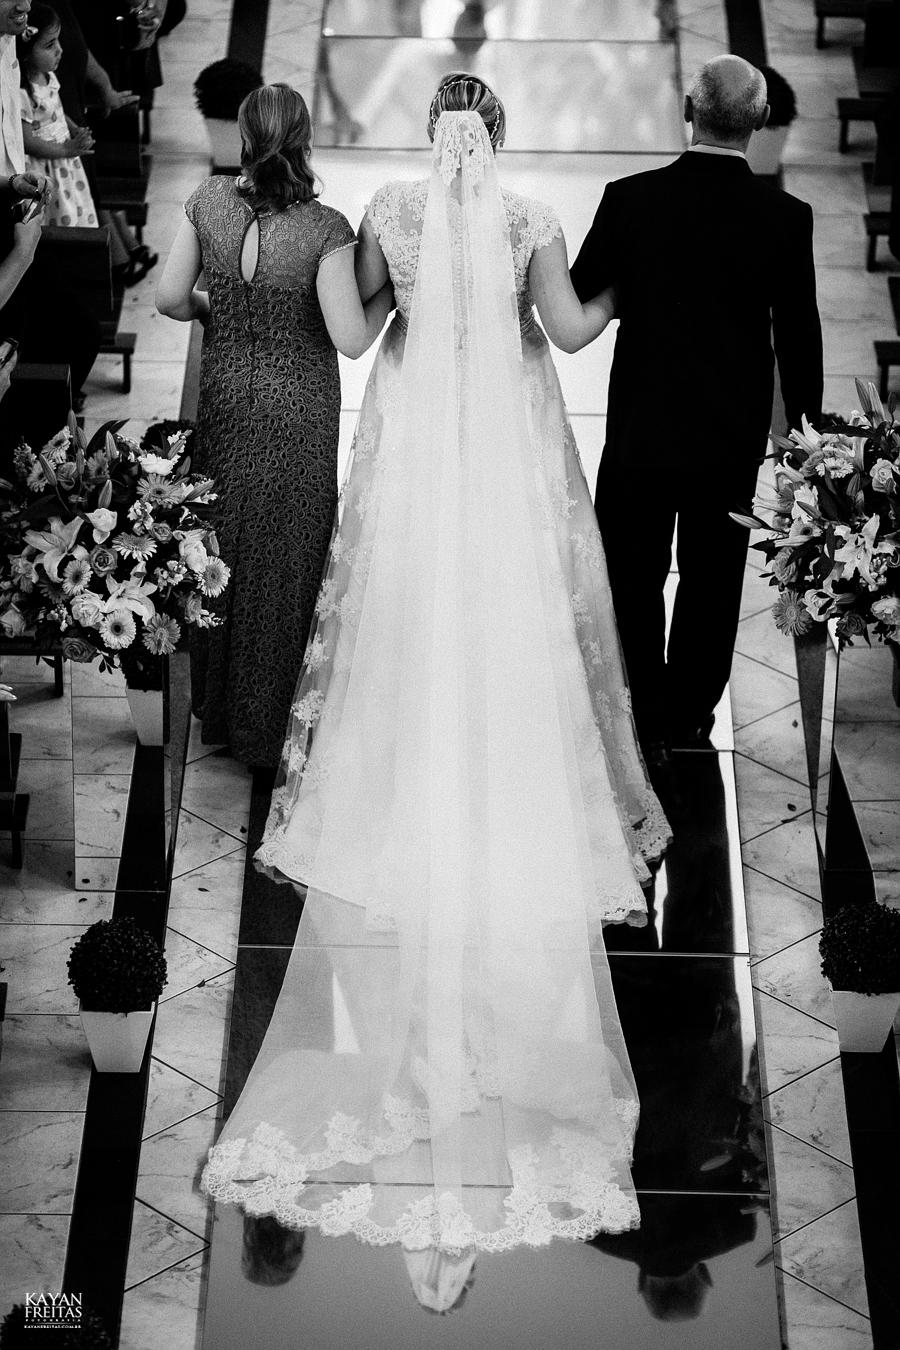 larissa-junior-casamento-0053 Larissa + Junior - Casamento em Biguaçu